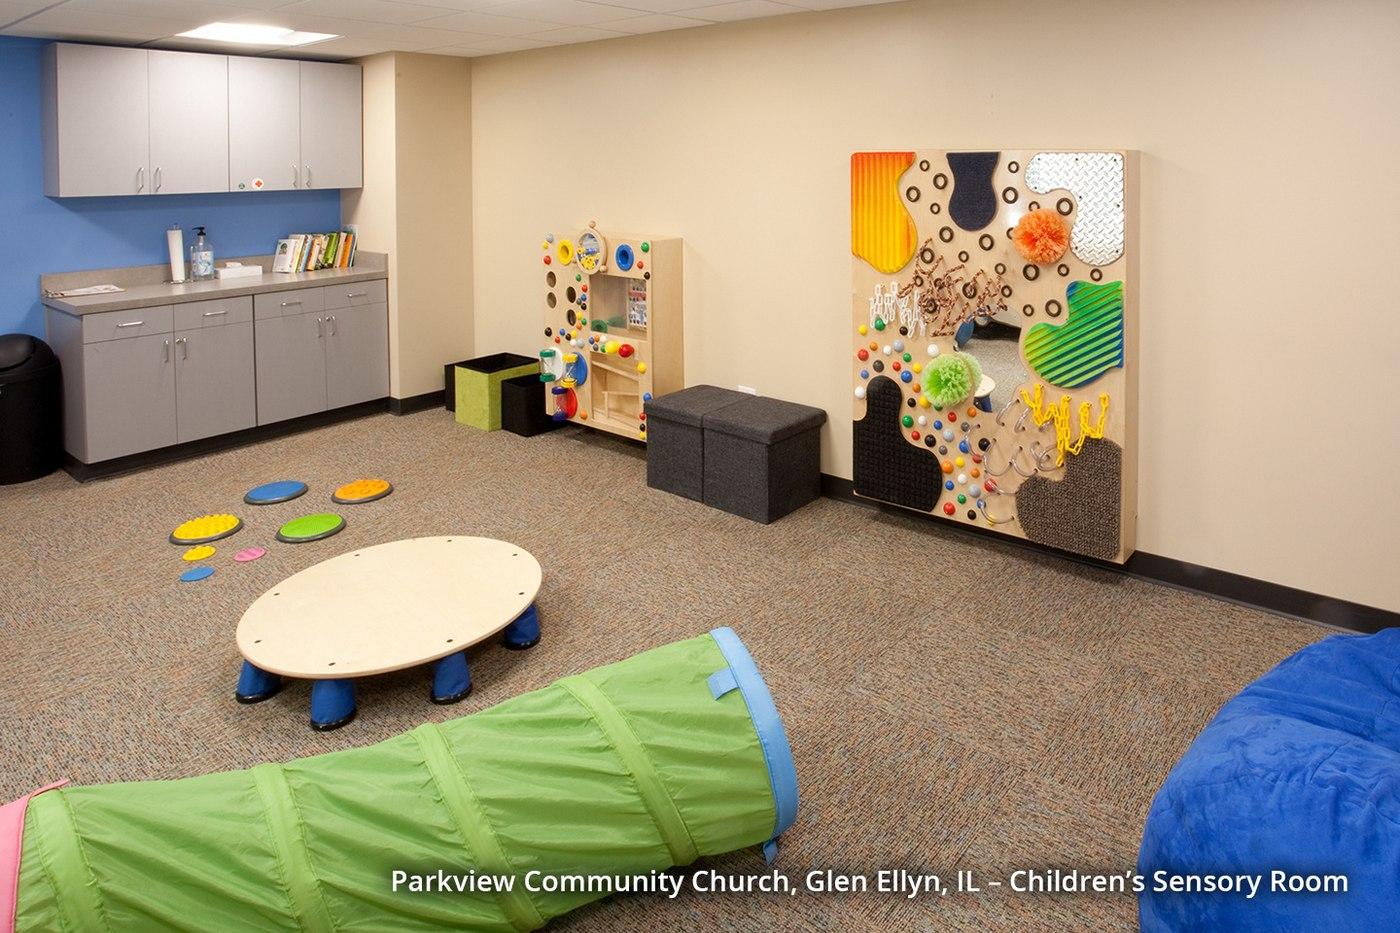 parkview-community-church-childrens